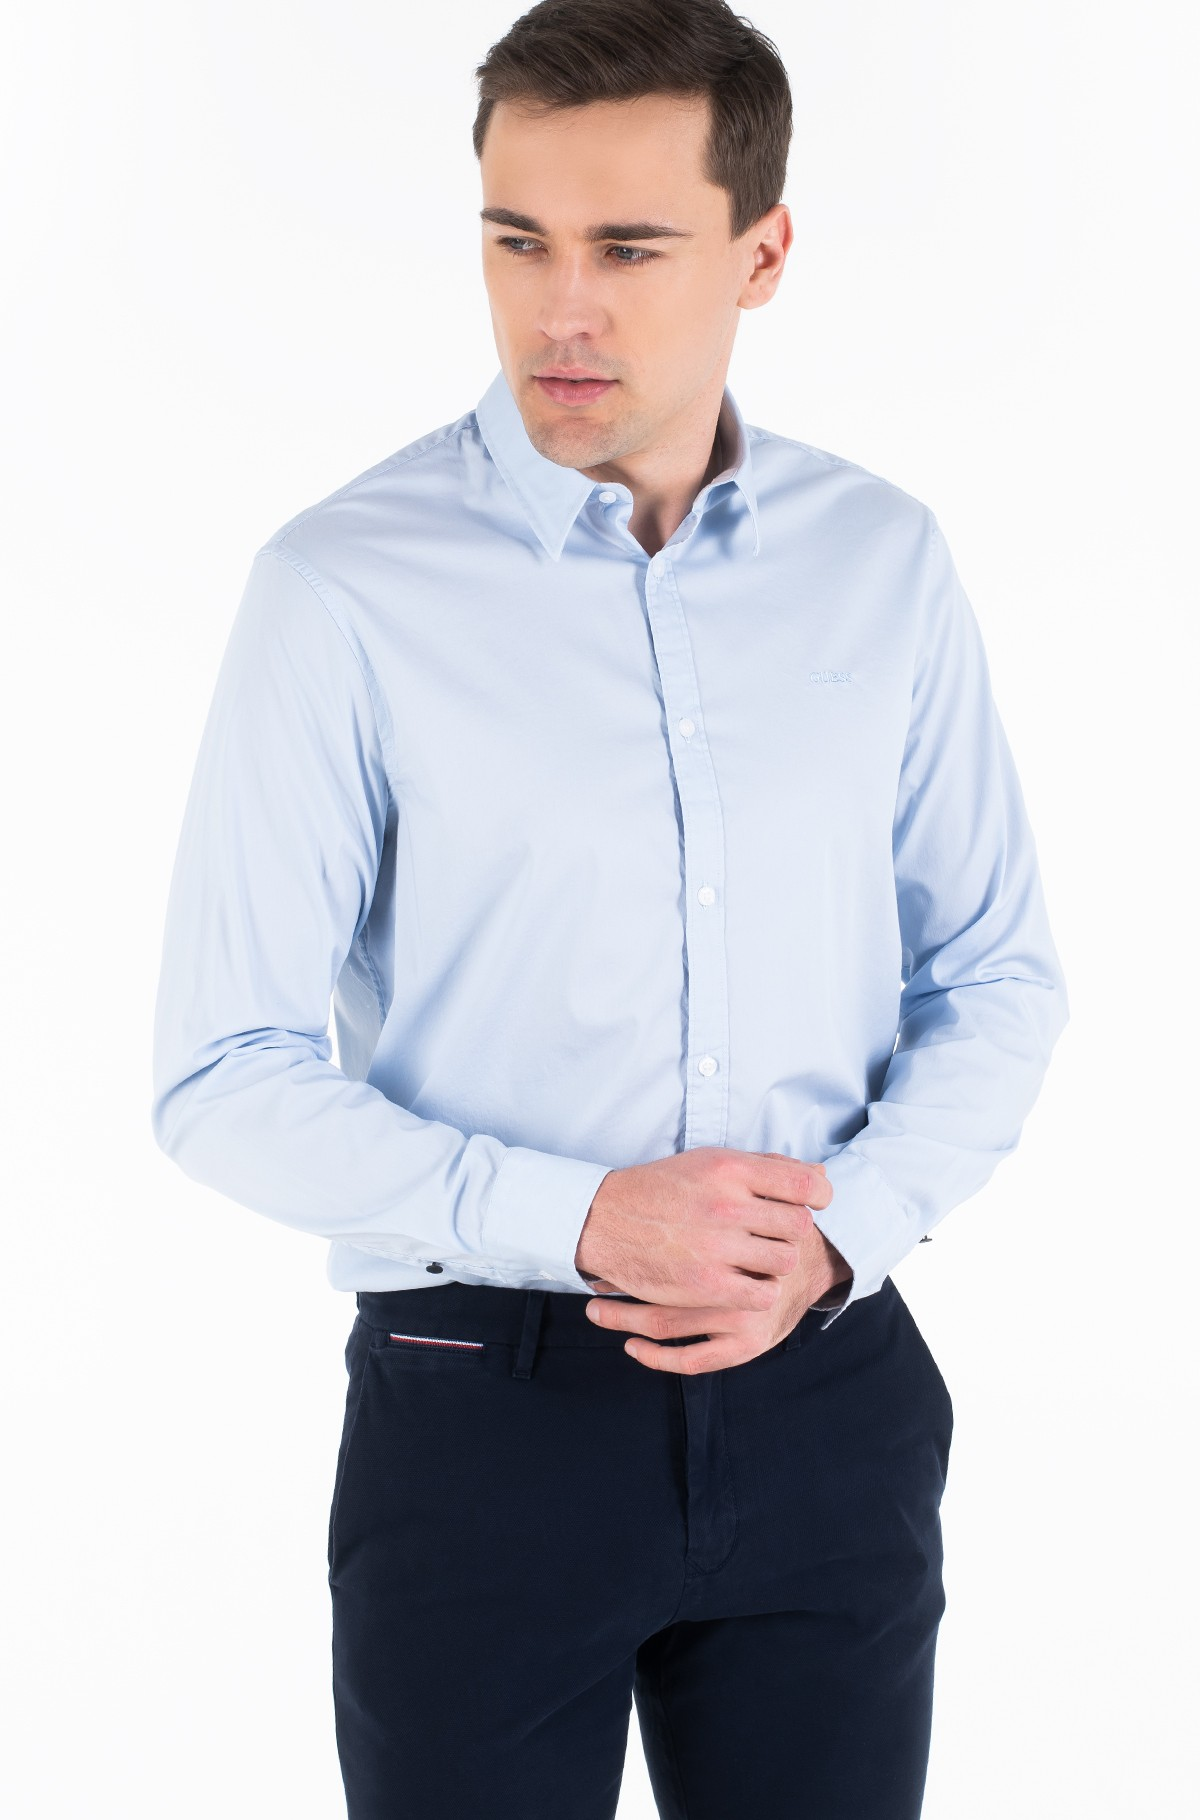 Marškiniai M01H25 W7ZK0-full-1